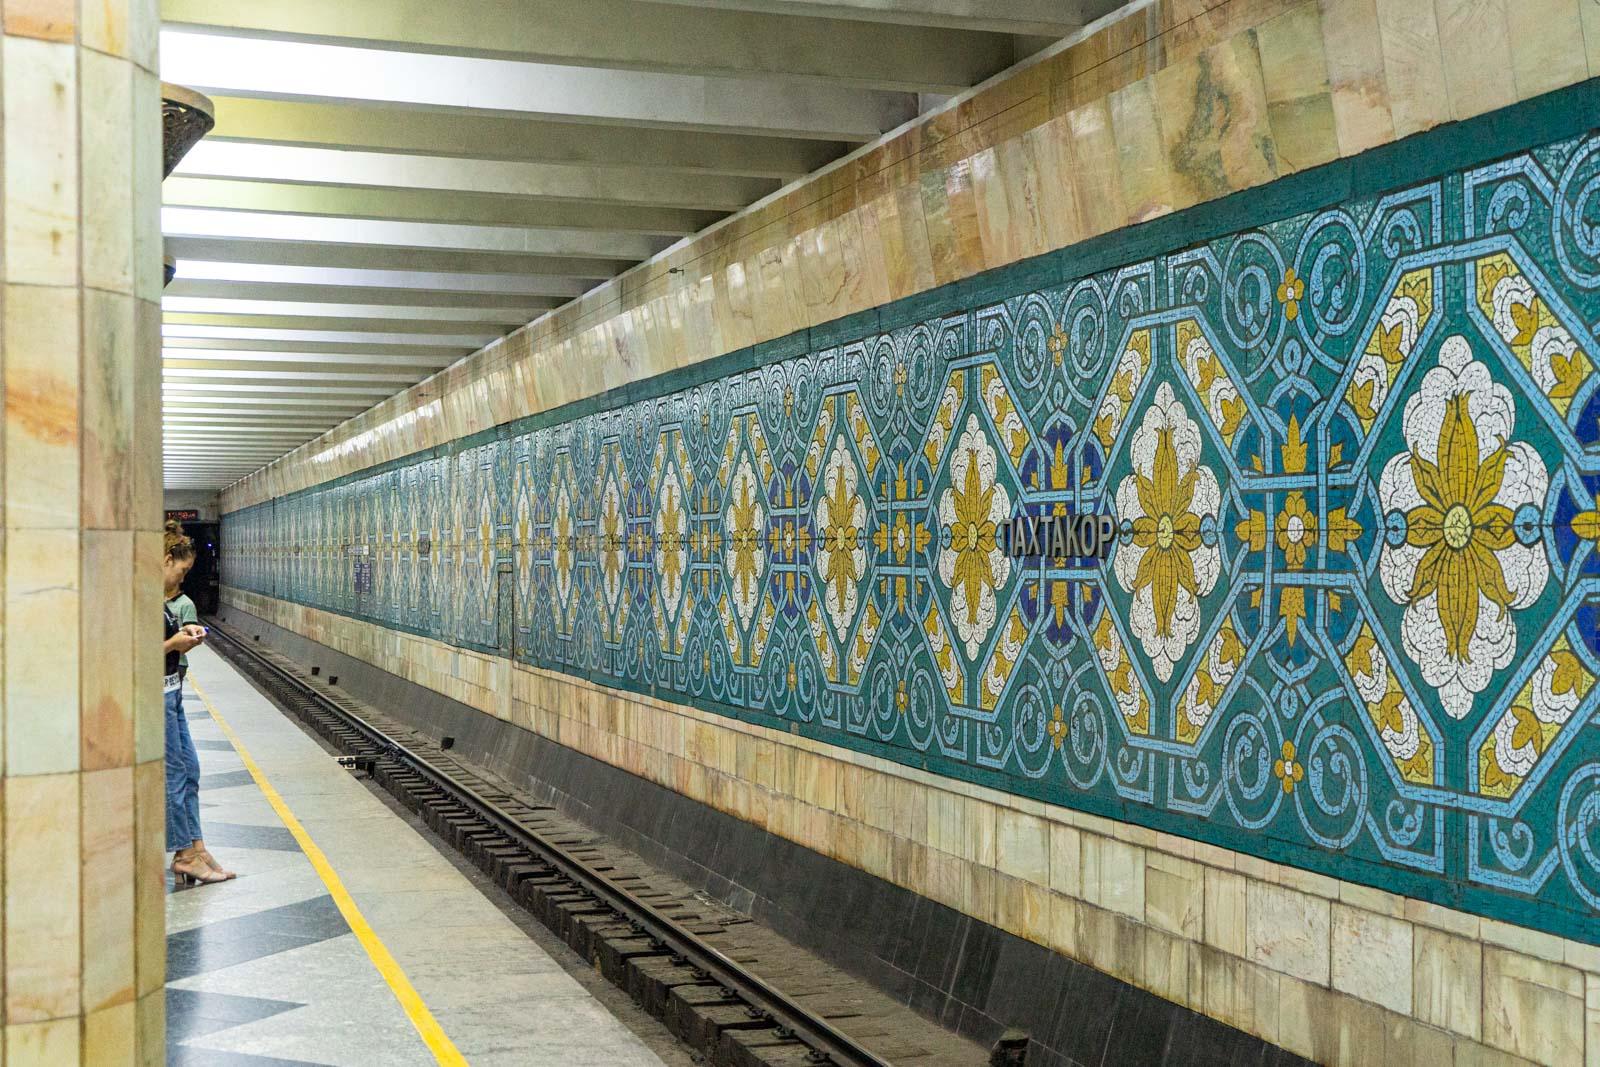 Tashkent Metro stations, Uzbekistan